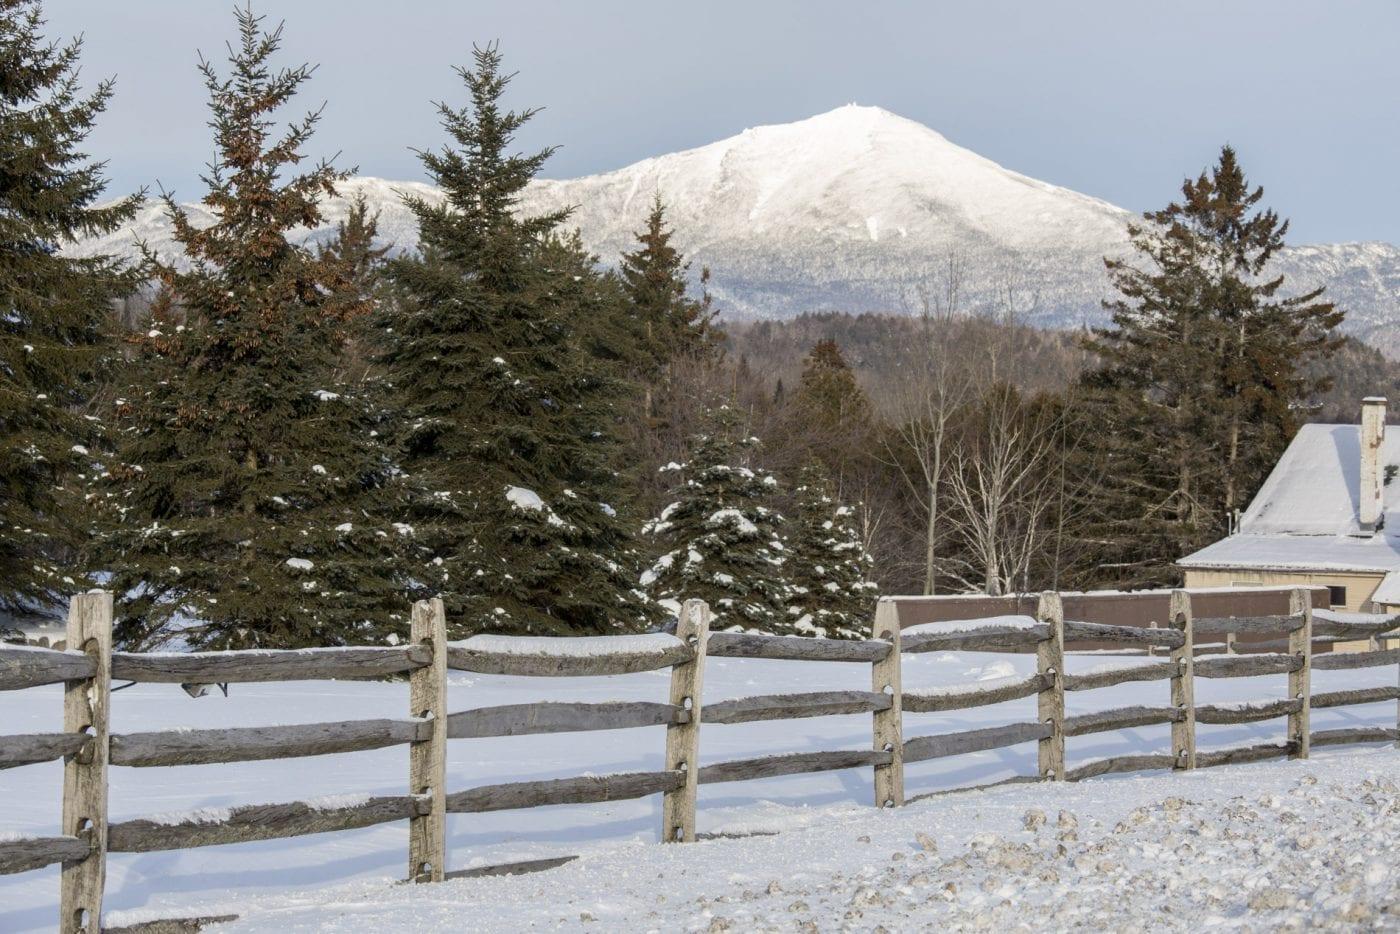 Snowy Peaks Adirondacks-Mike-Lynch-22